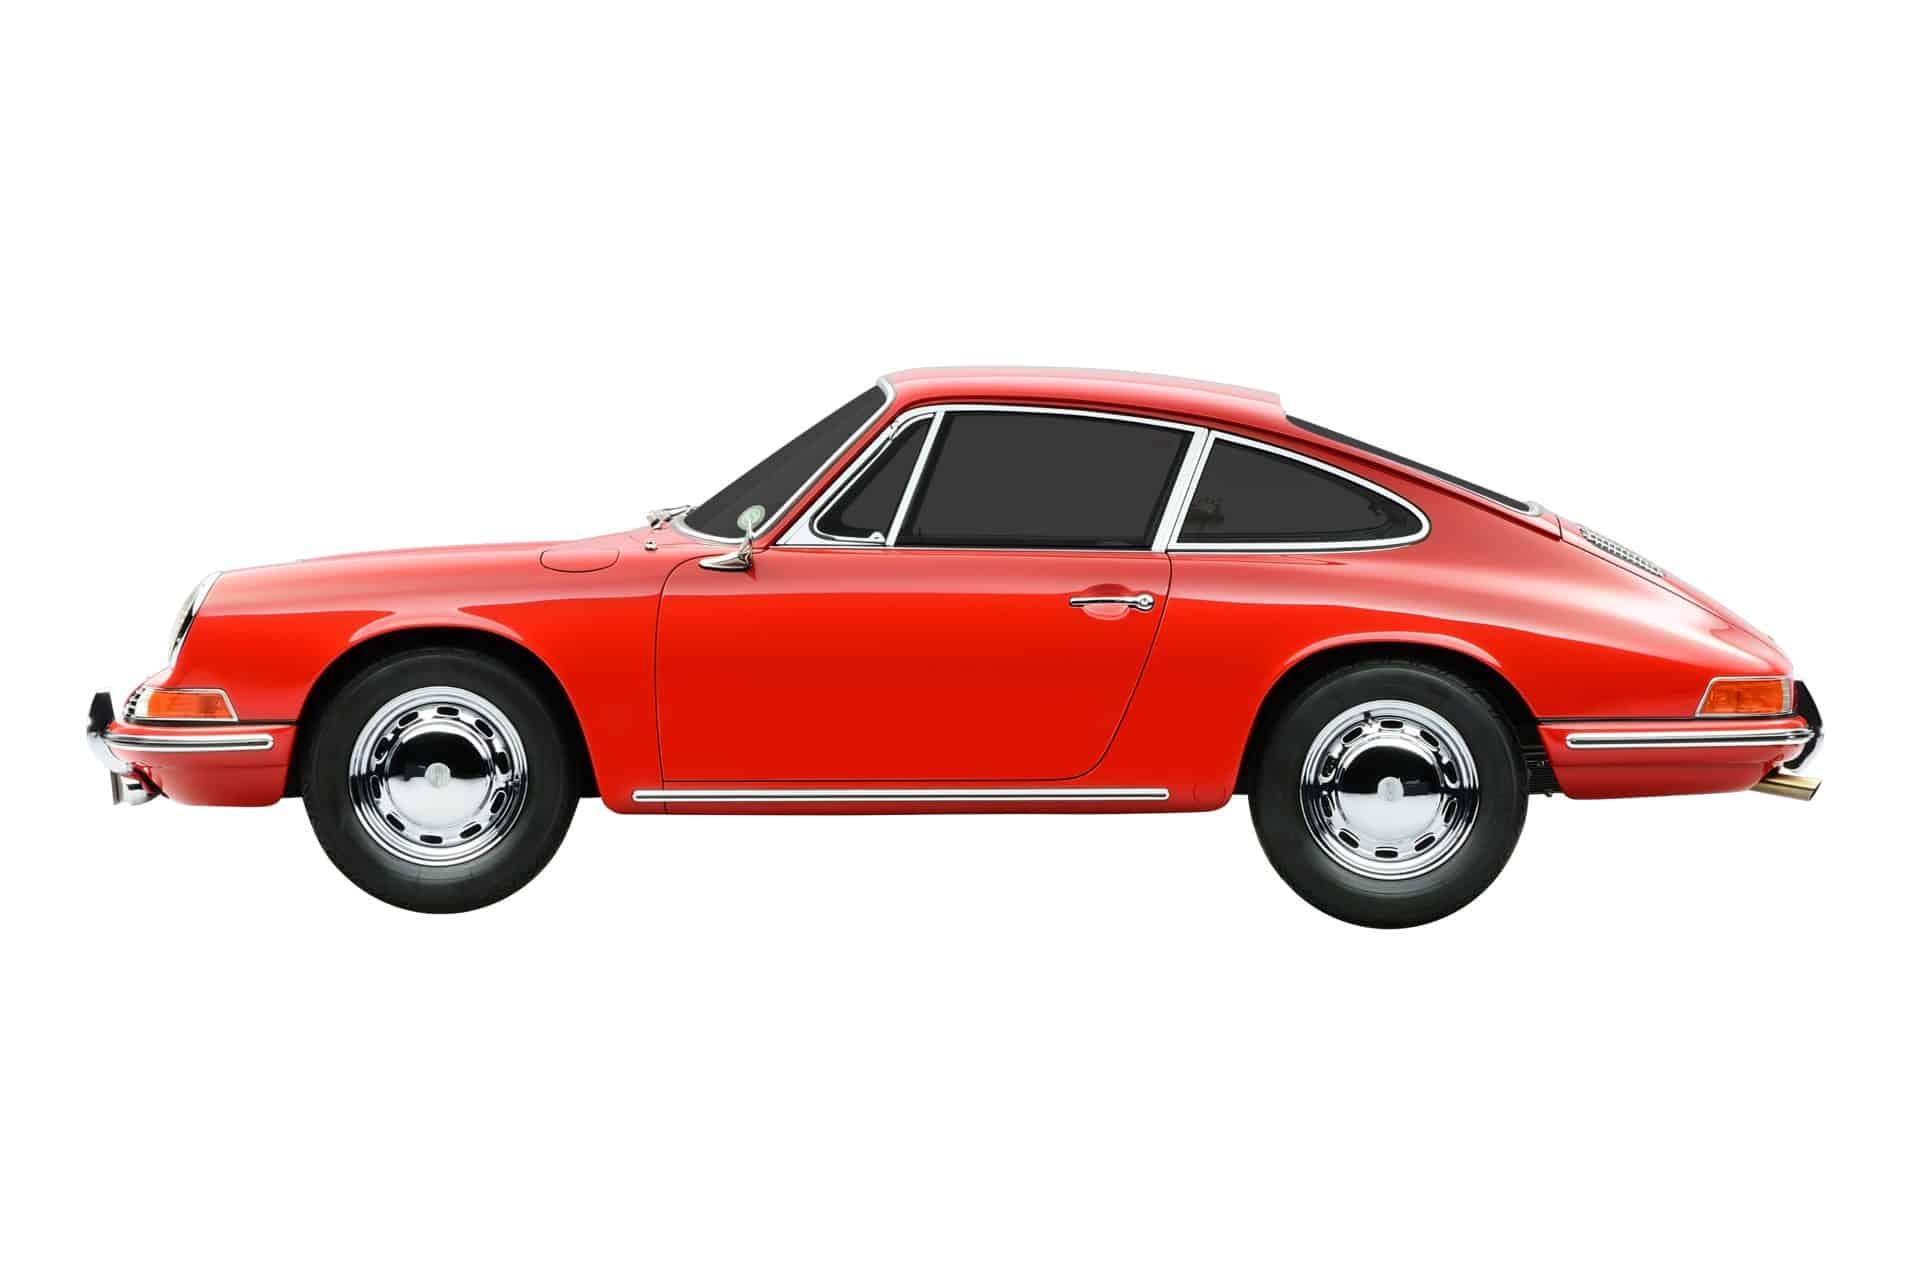 Porsche 911 ab 1963